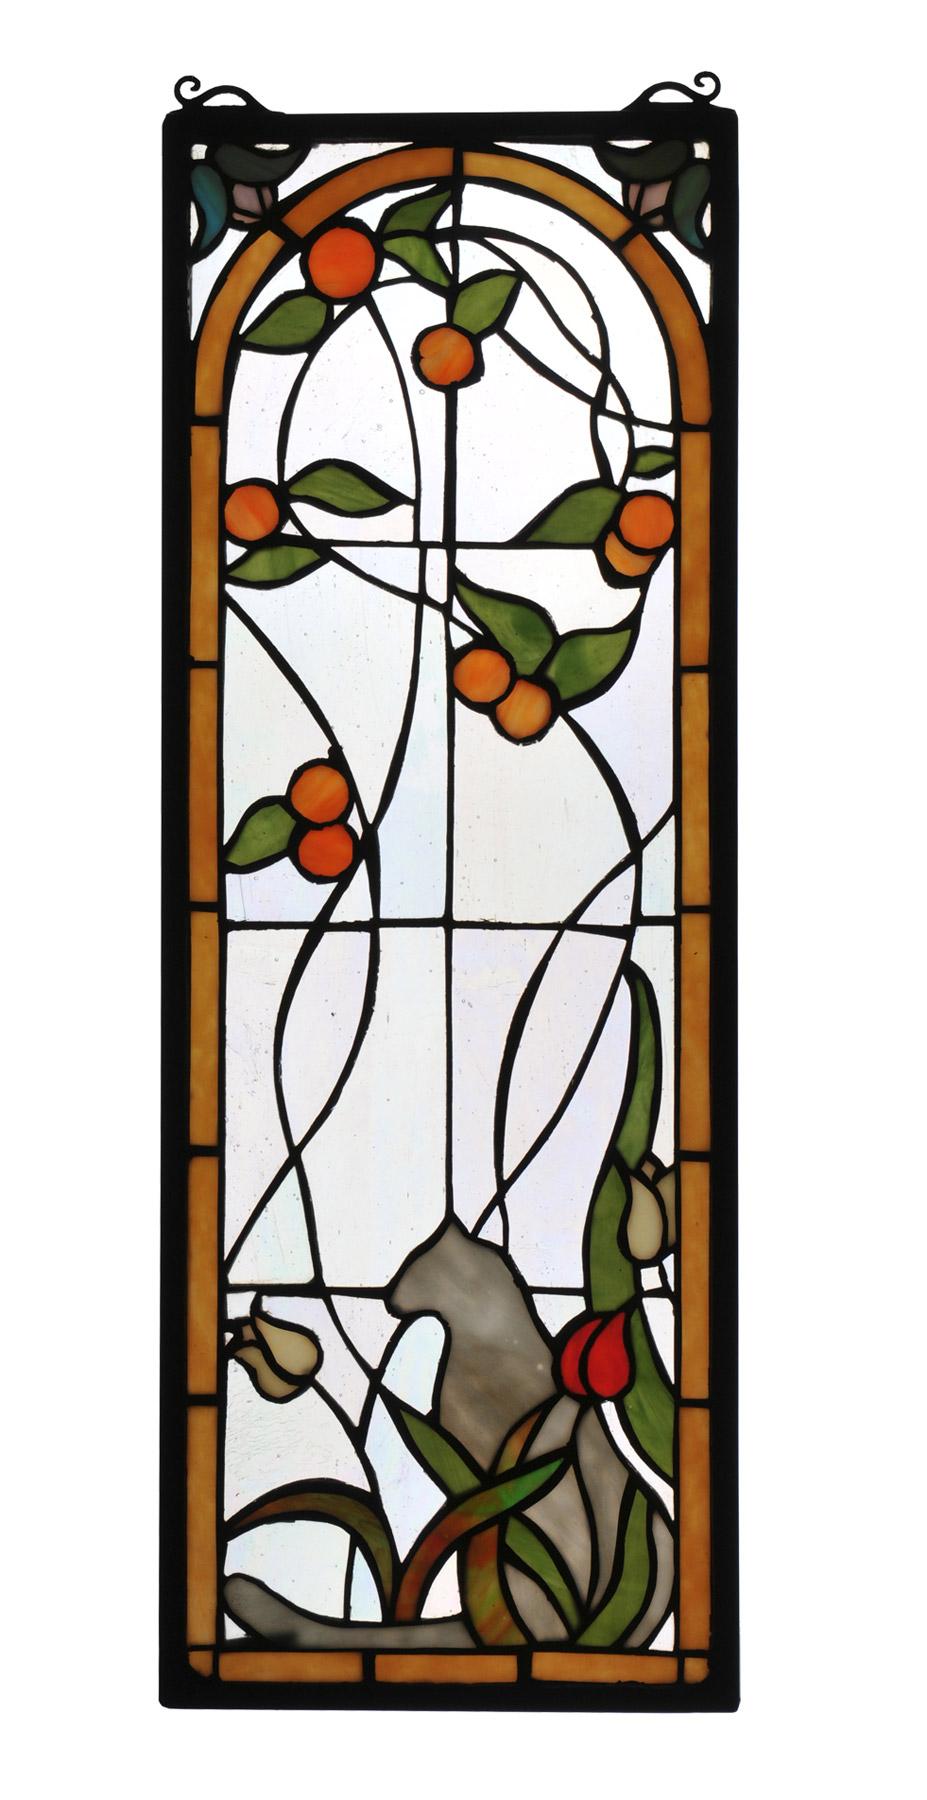 Meyda 67117 Tiffany Tulip Amp Peaches Stained Glass Window